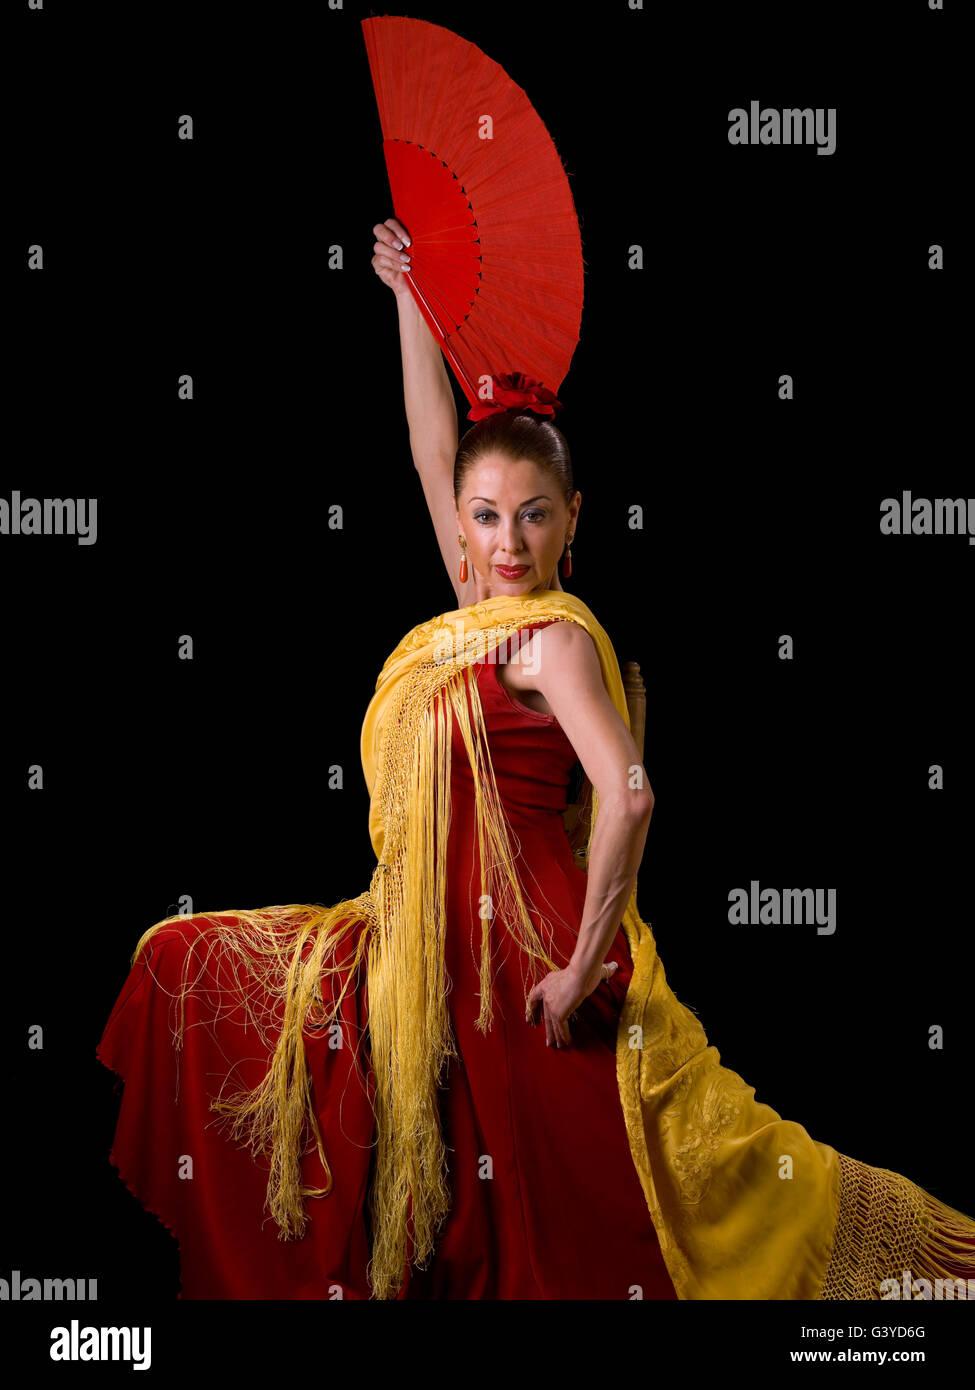 spanish woman flamenco dancing looking at the camera stock photo